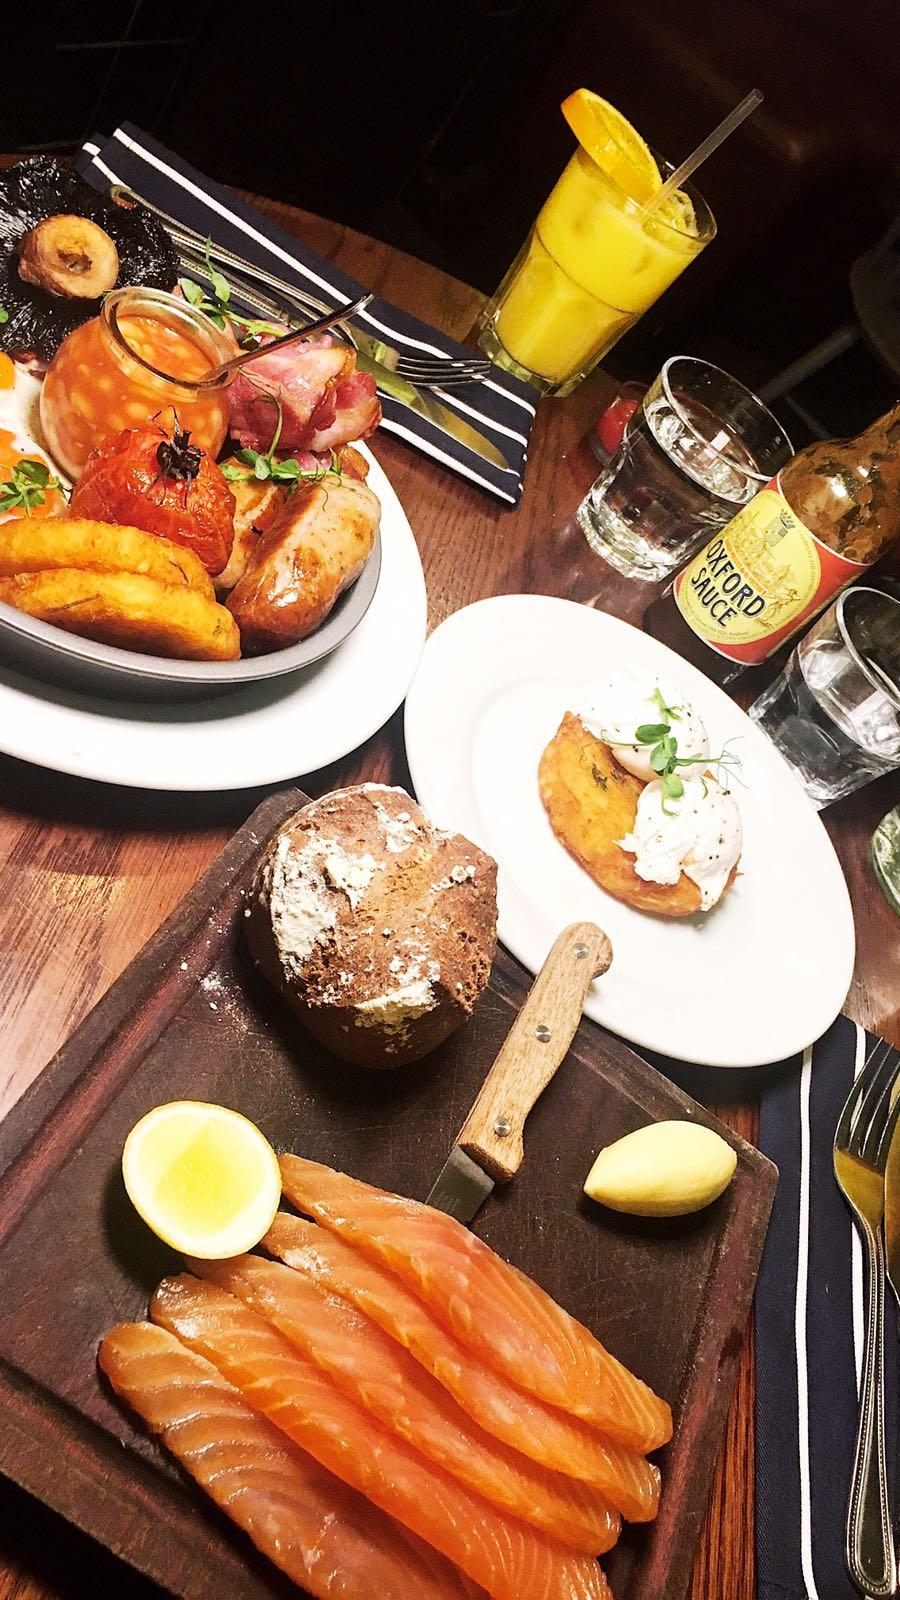 Smoked salmon, full English breakfast Parlour Kensal Rise